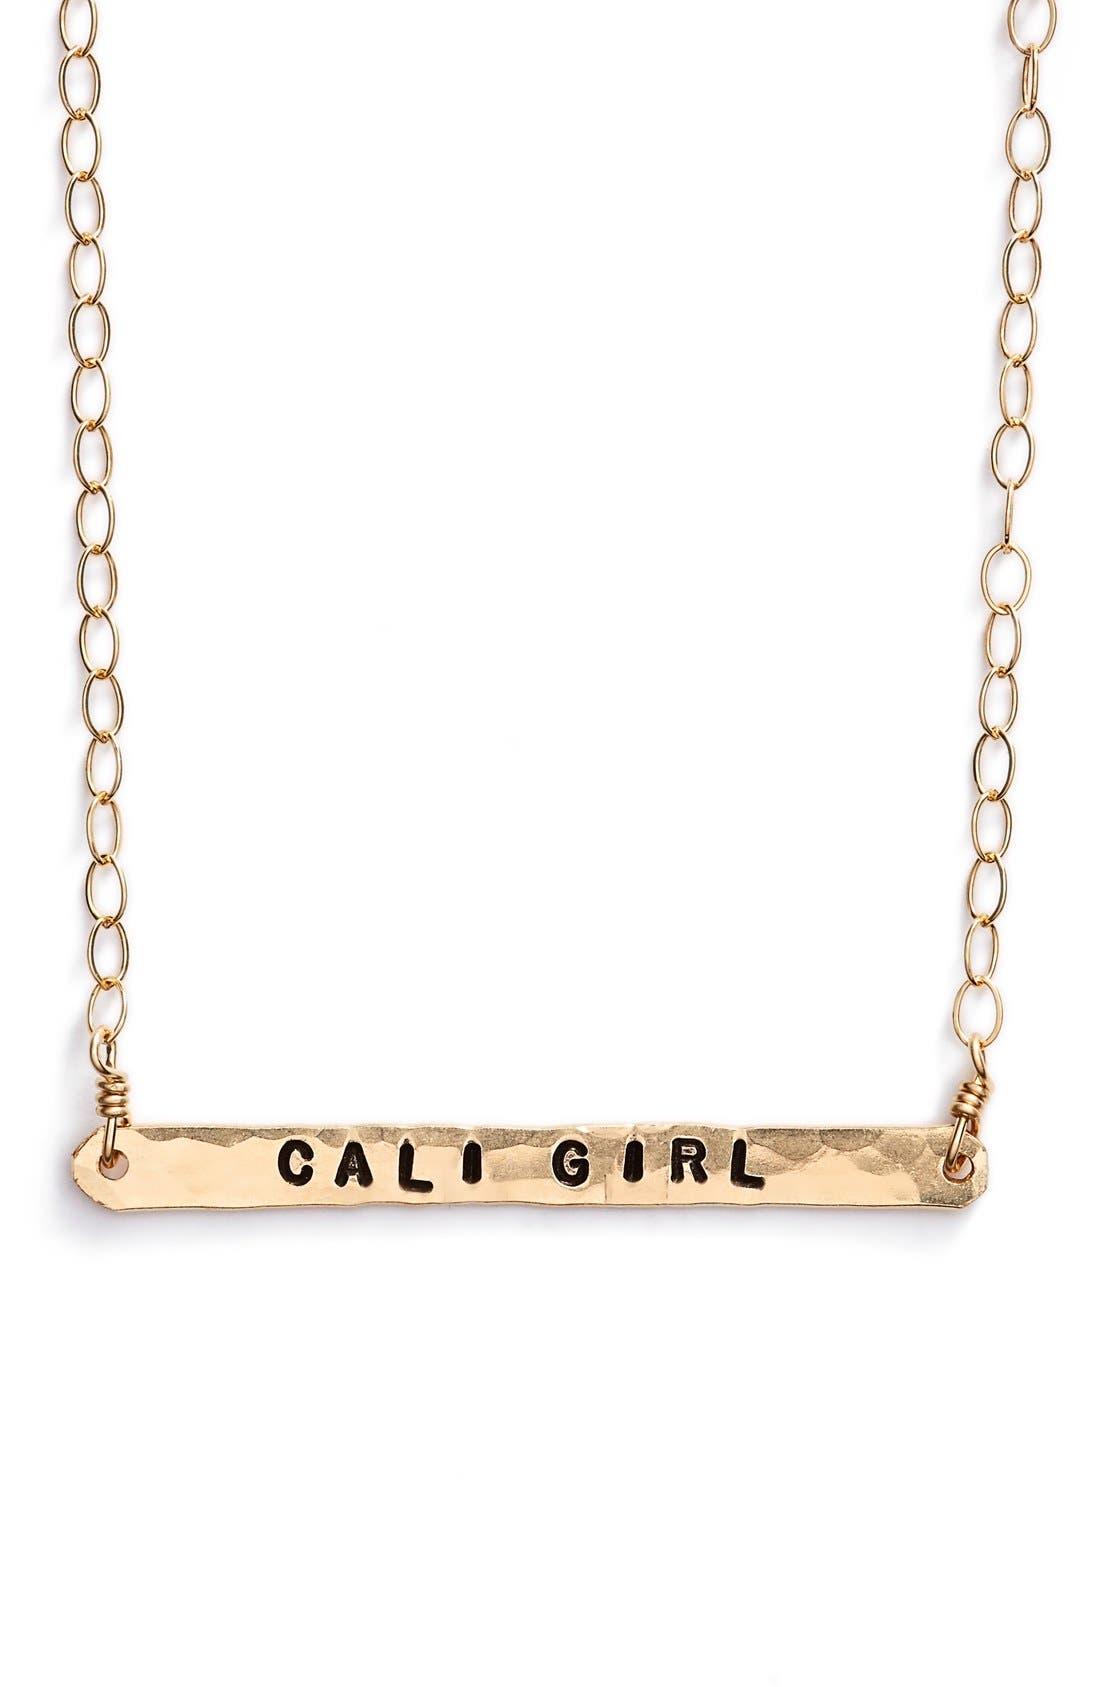 Alternate Image 1 Selected - ki-ele 'Cali Girl' Engraved Pendant Necklace